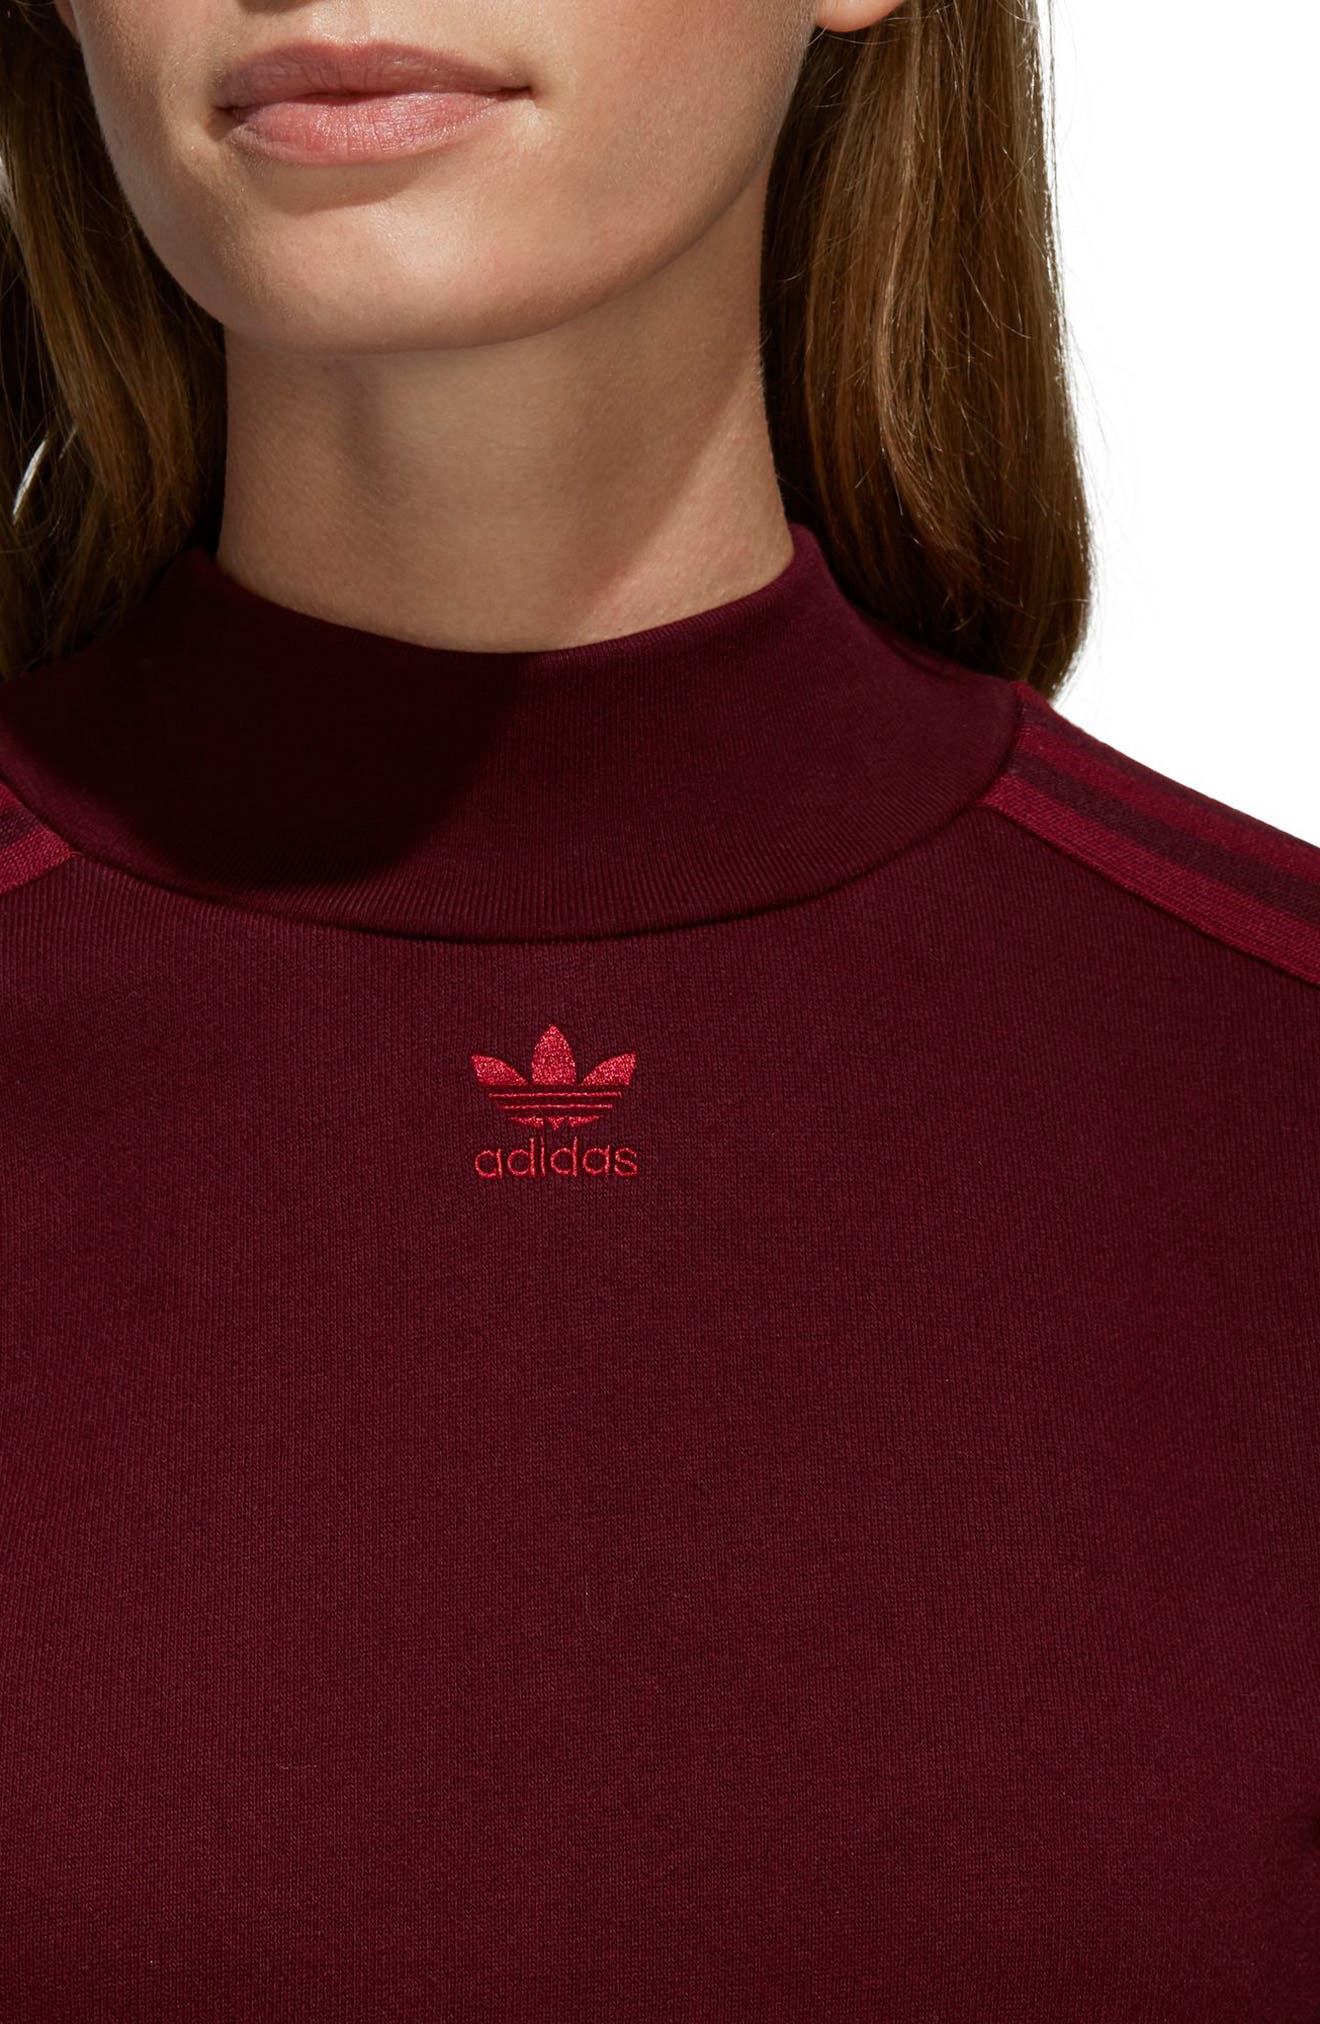 Originals Adibreak Sweatshirt,                             Alternate thumbnail 4, color,                             Maroon